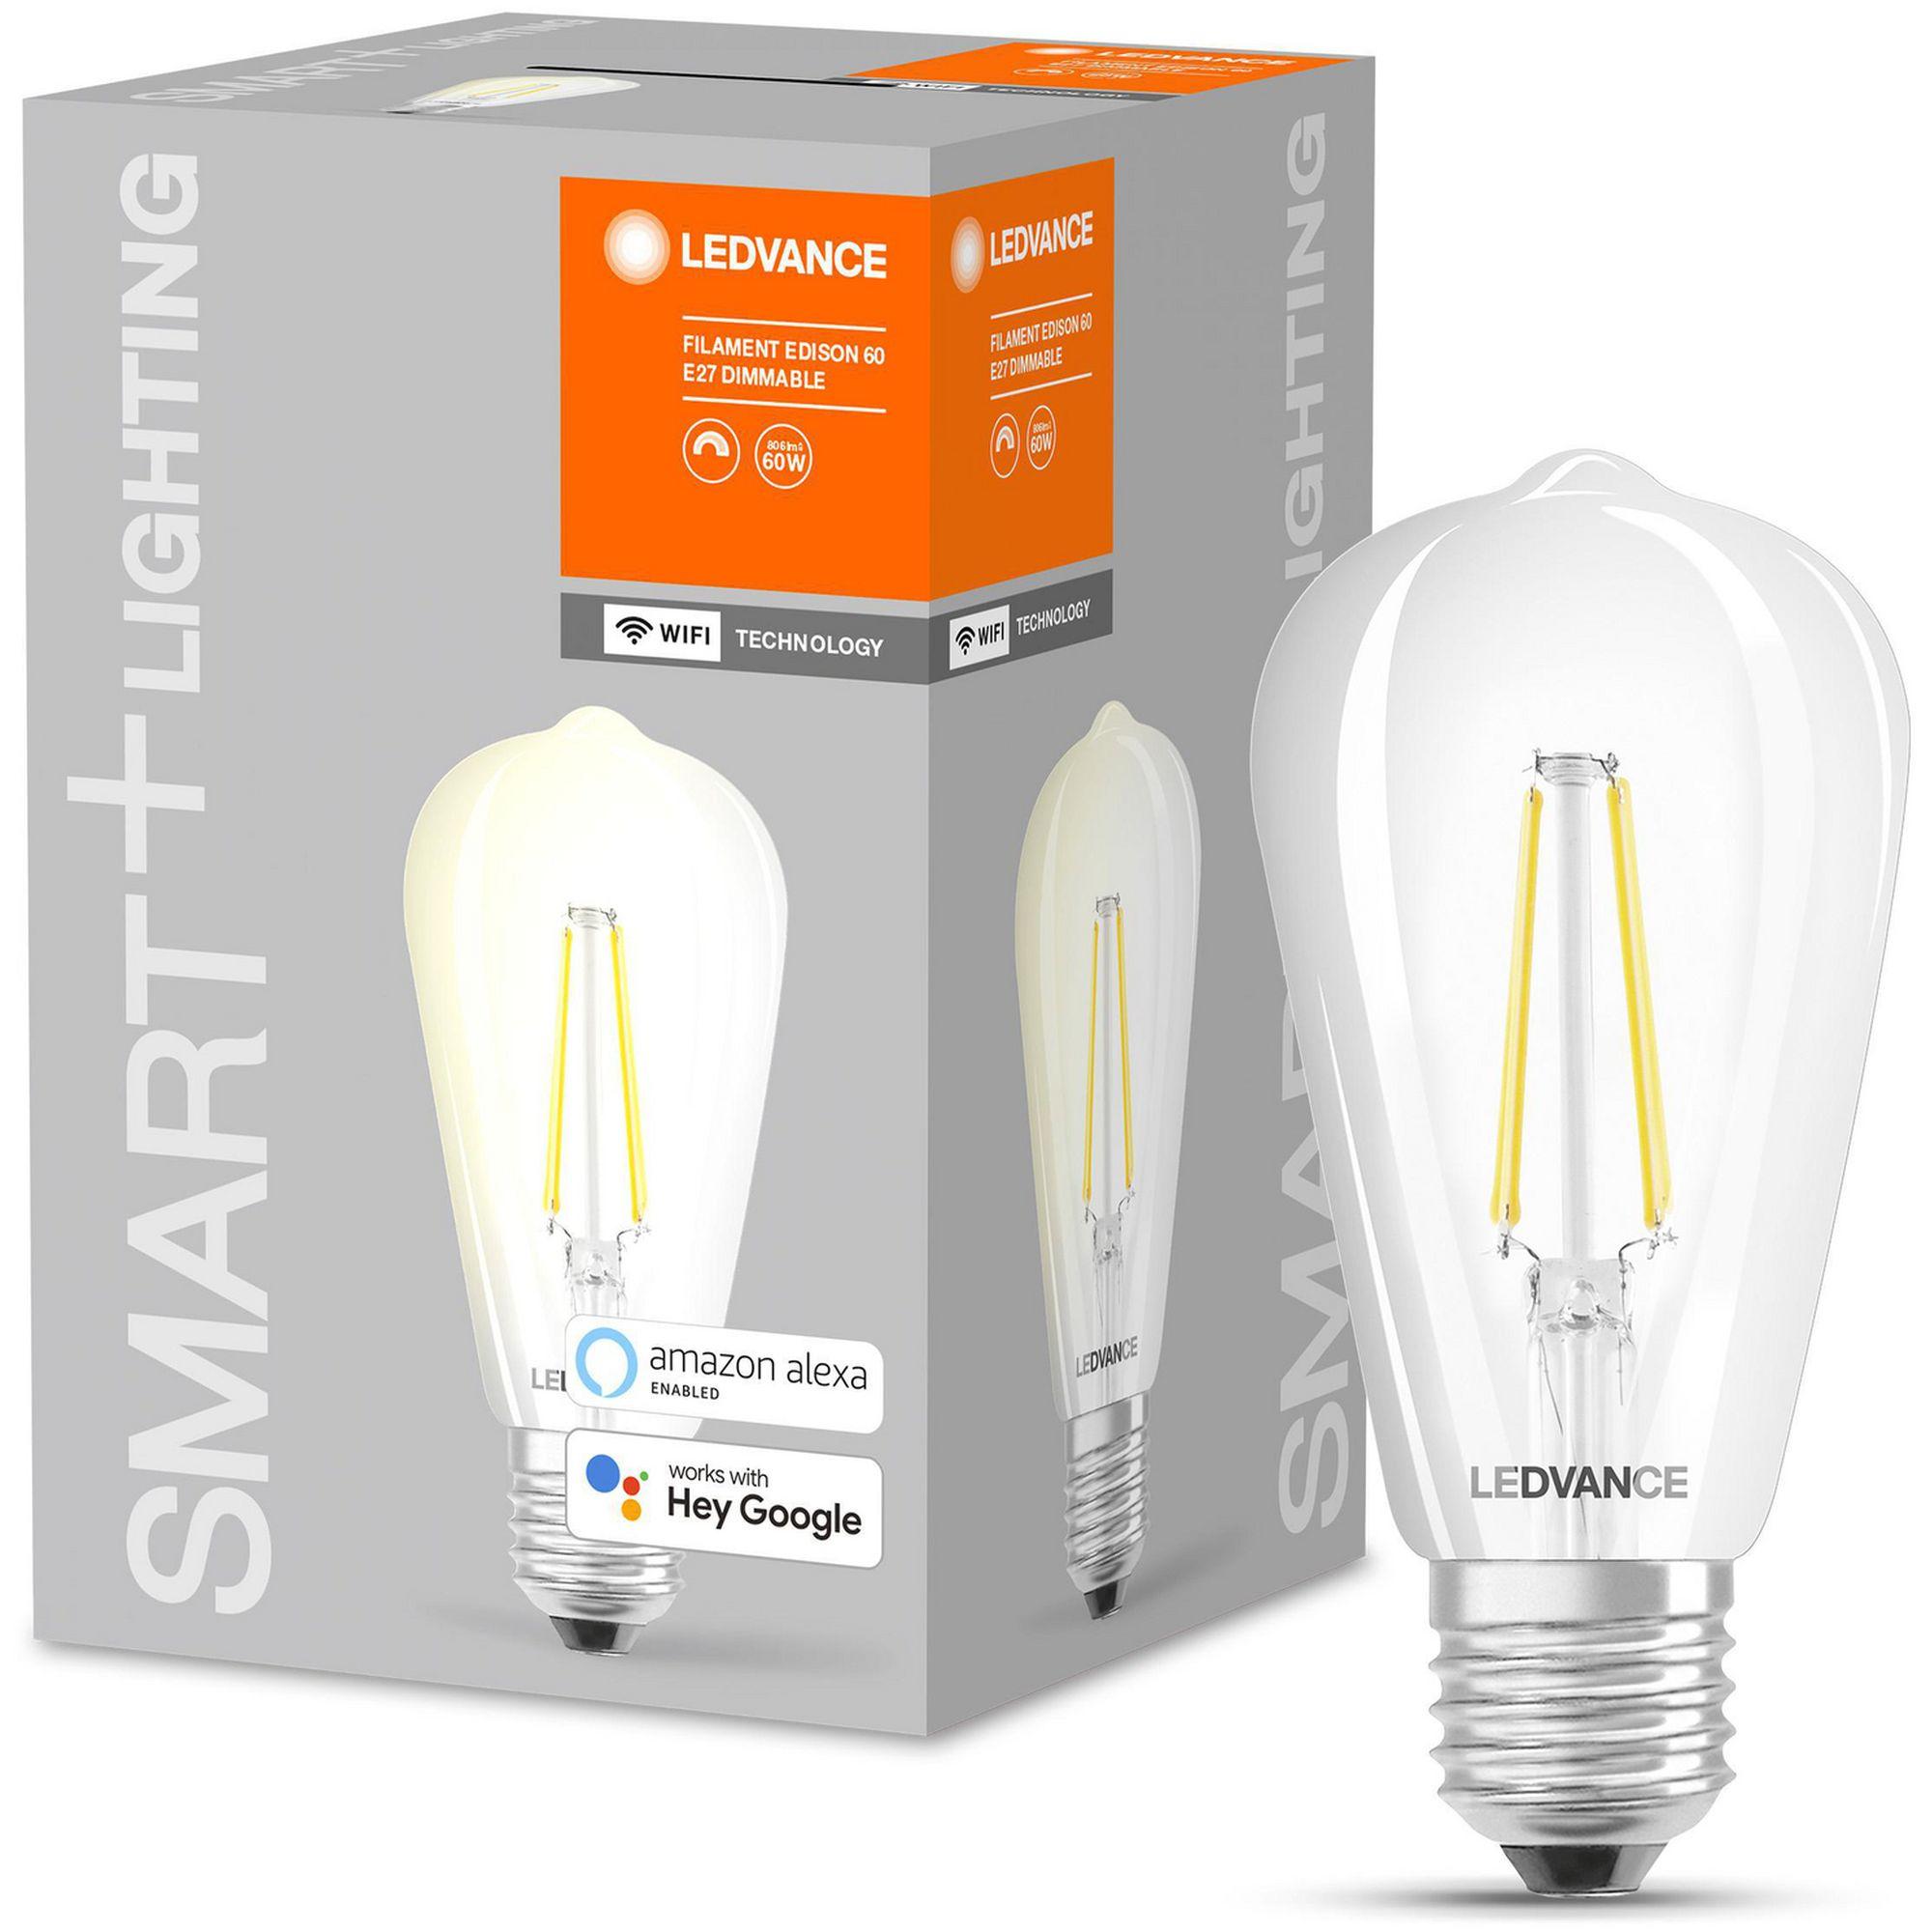 LEDVANCE - SMART+ edison 60W/827 Clear Filament E27 WiFi